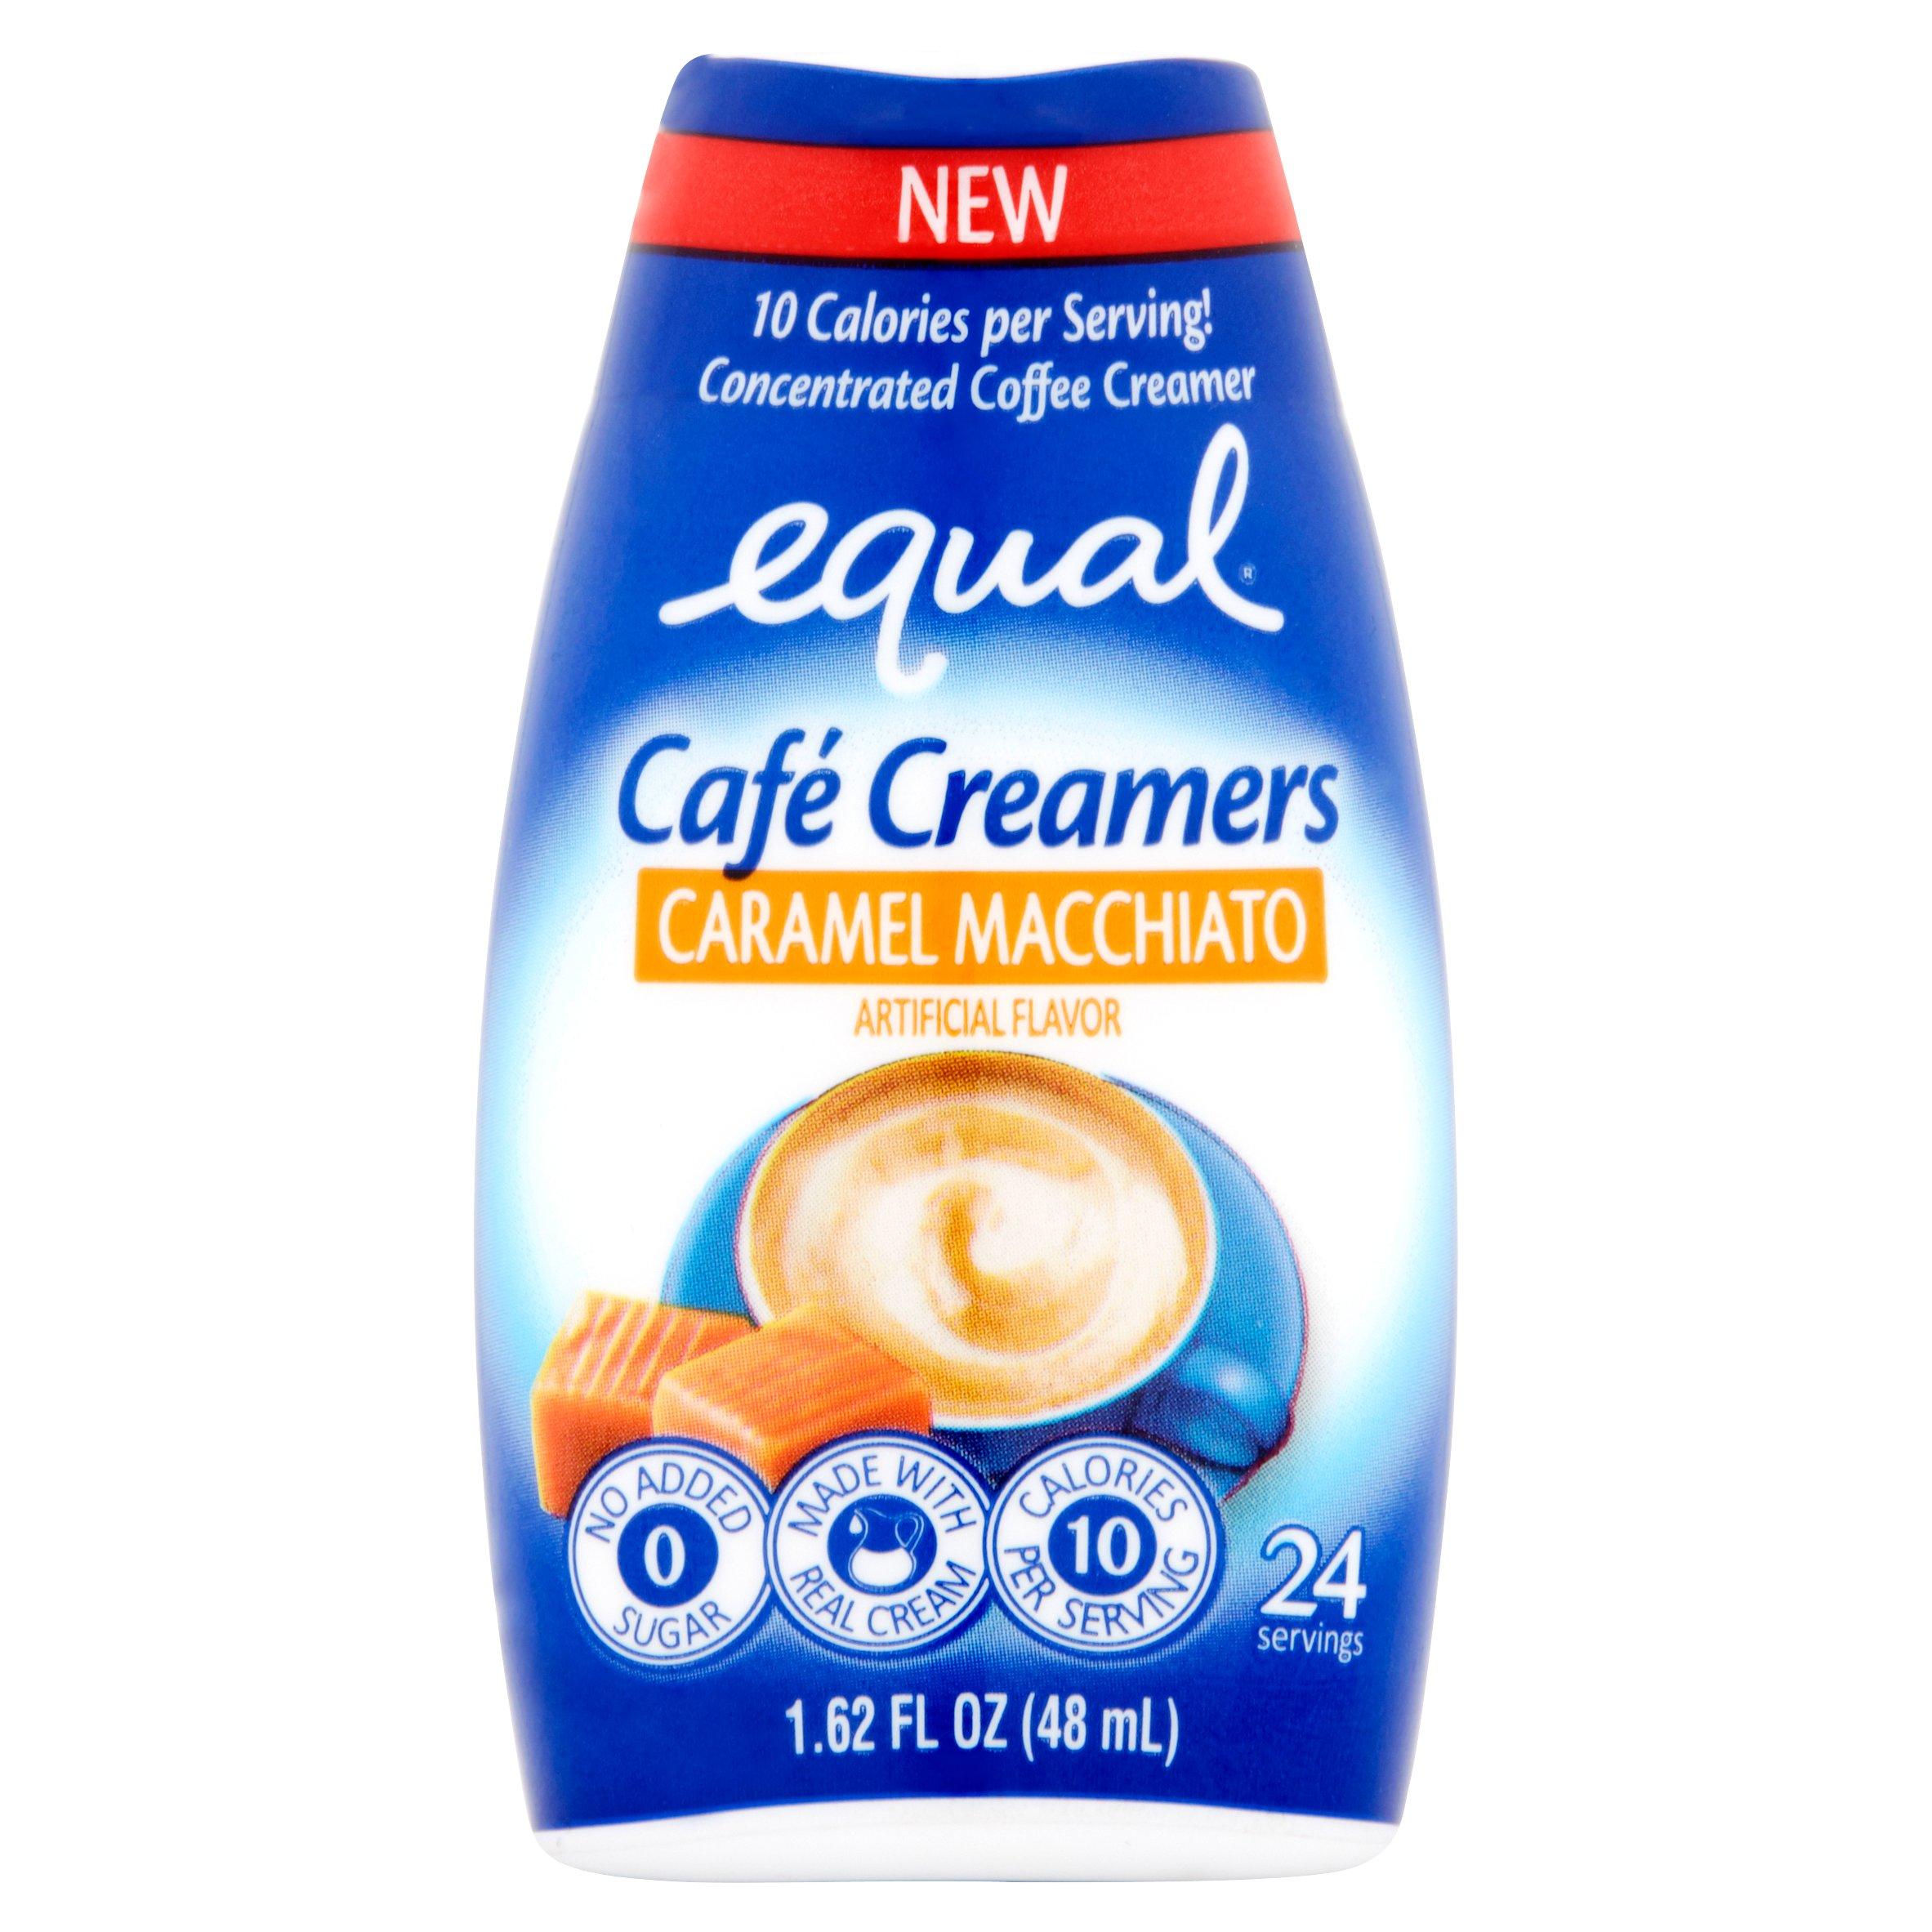 (6 Pack) Equal Cafe Creamers Caramel Macchiato, Low-Calorie Coffee Creamer, 1.62 Fl Oz